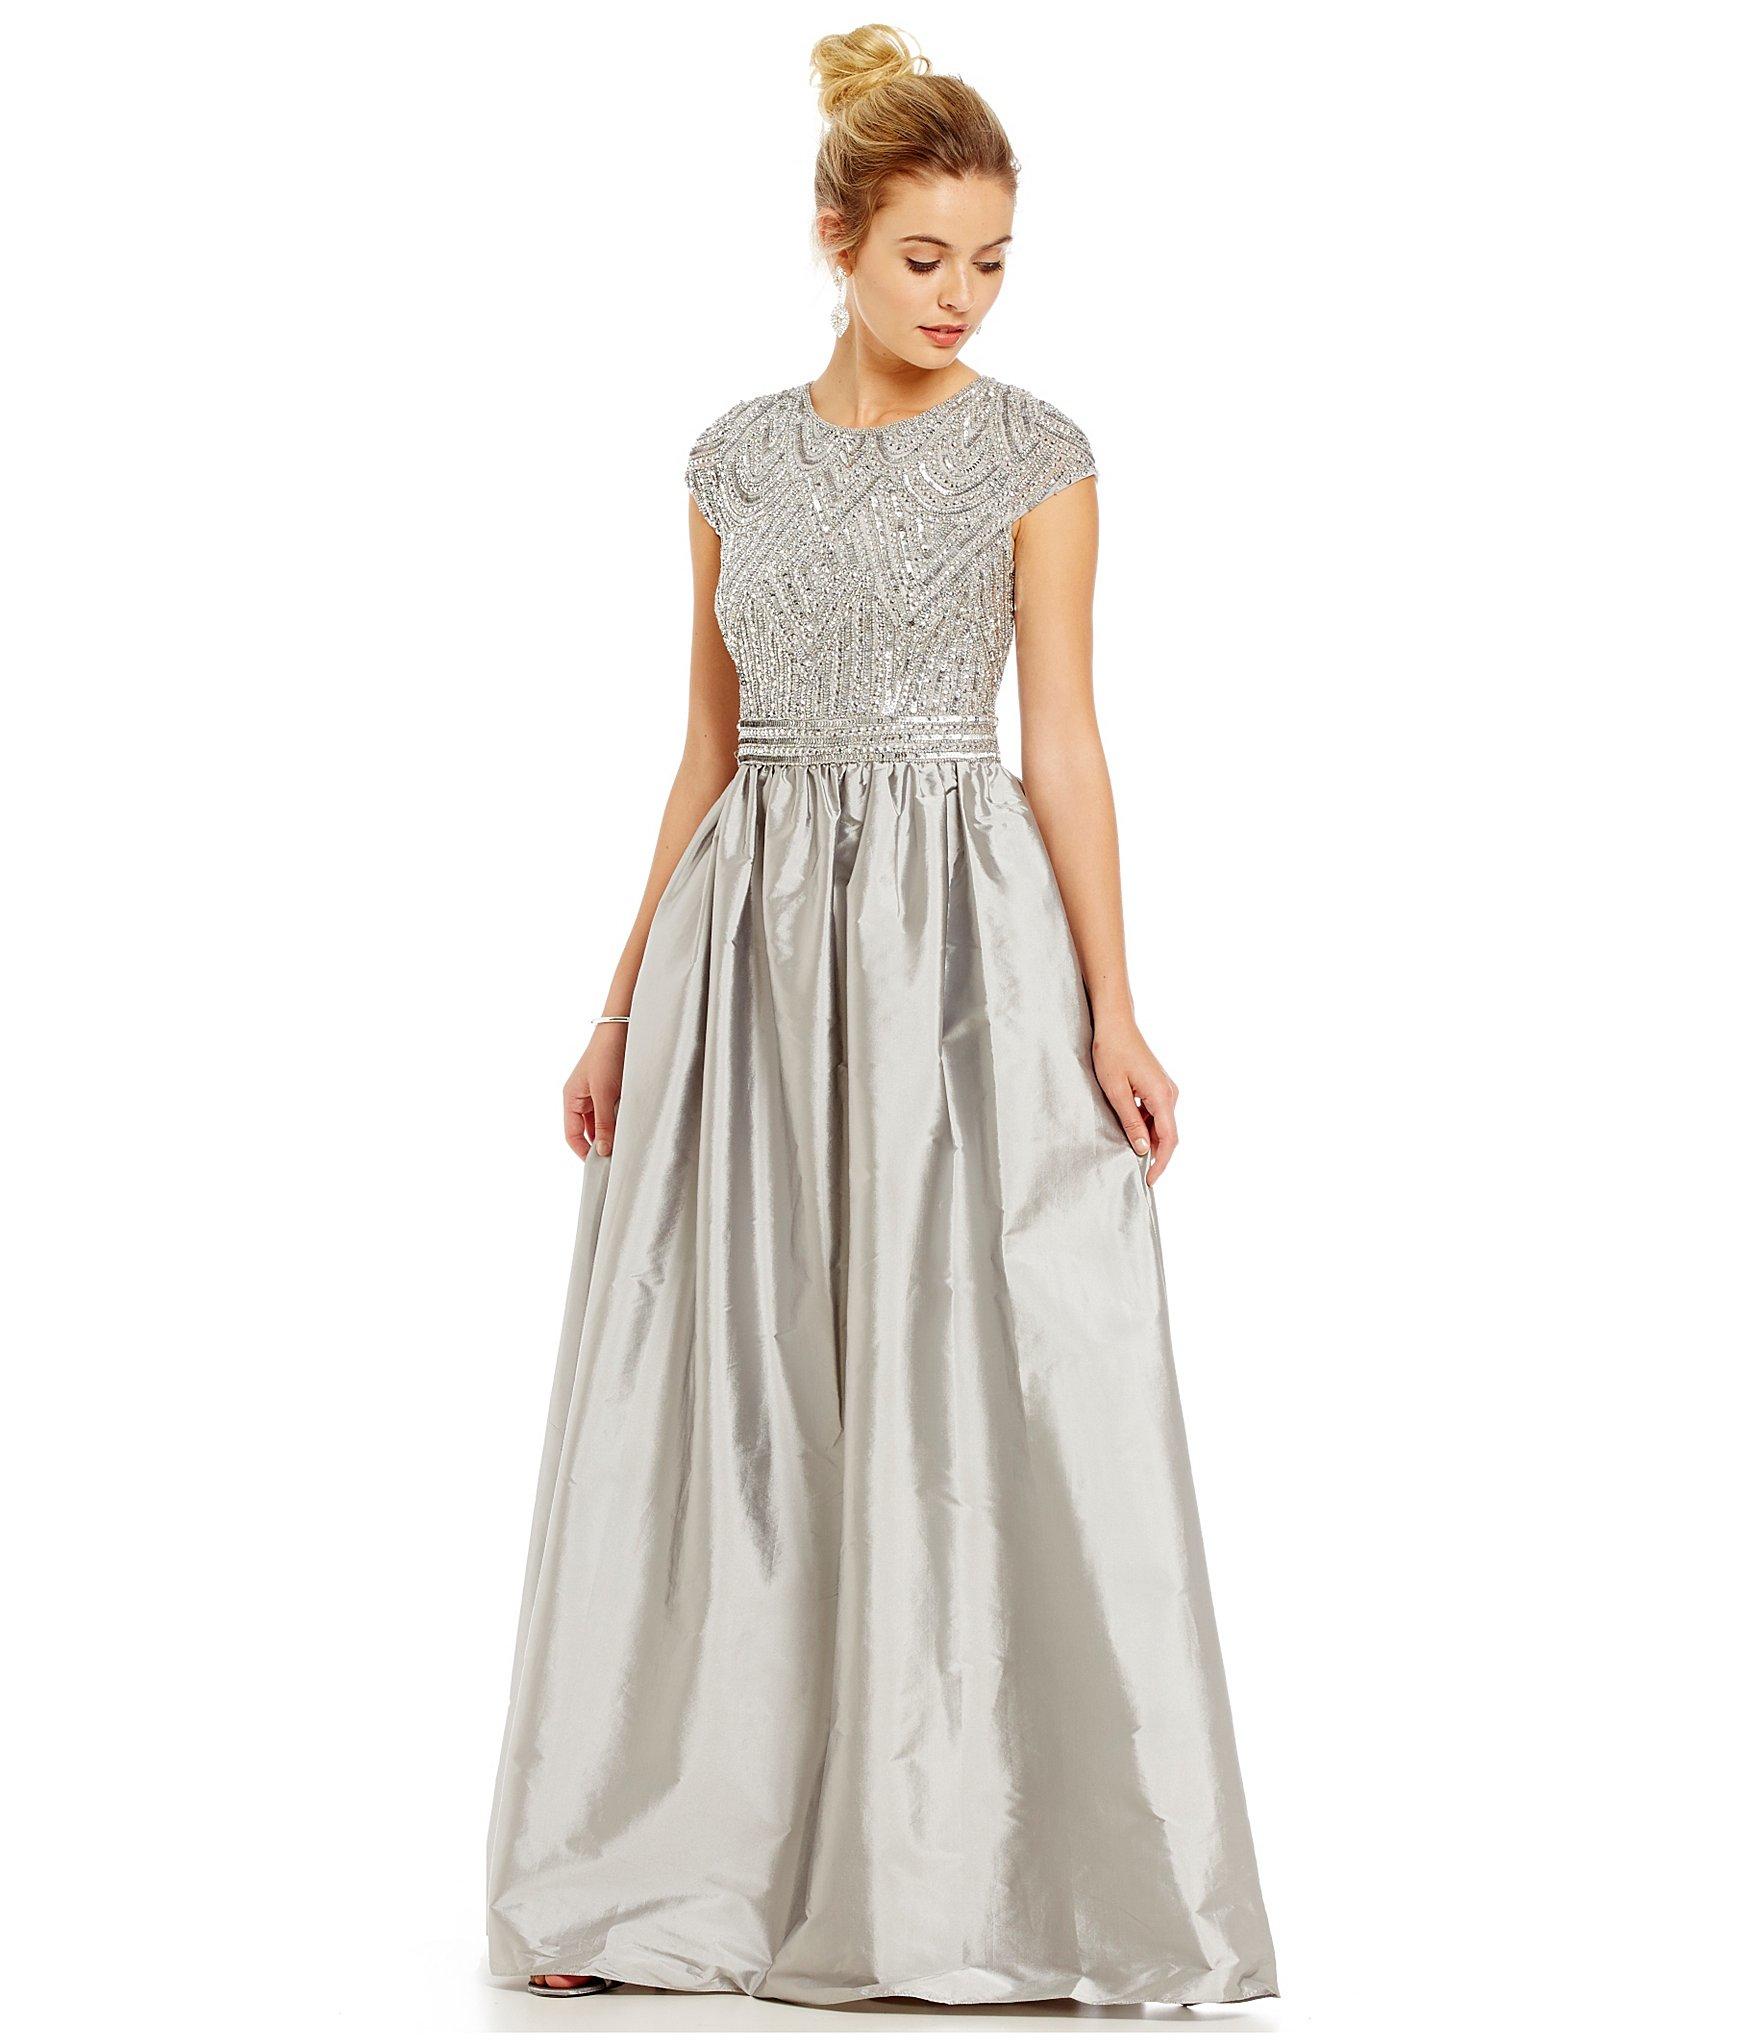 db8279c154 Lyst - Adrianna Papell Beaded Bodice Taffeta Skirt Ballgown in Gray